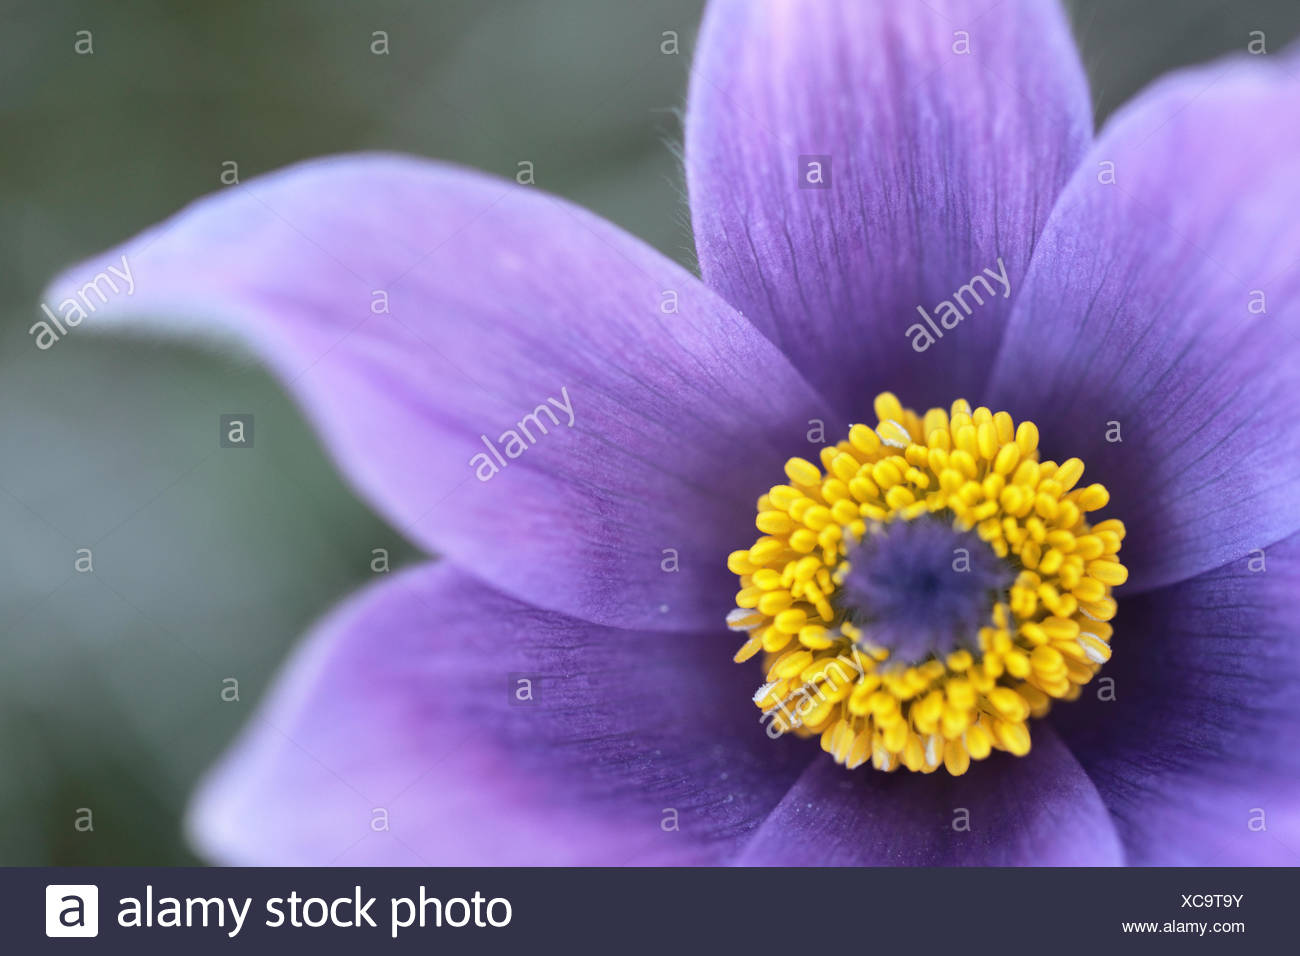 Close up of Great pasqueflower, Pulsatilla grandis. - Stock Image